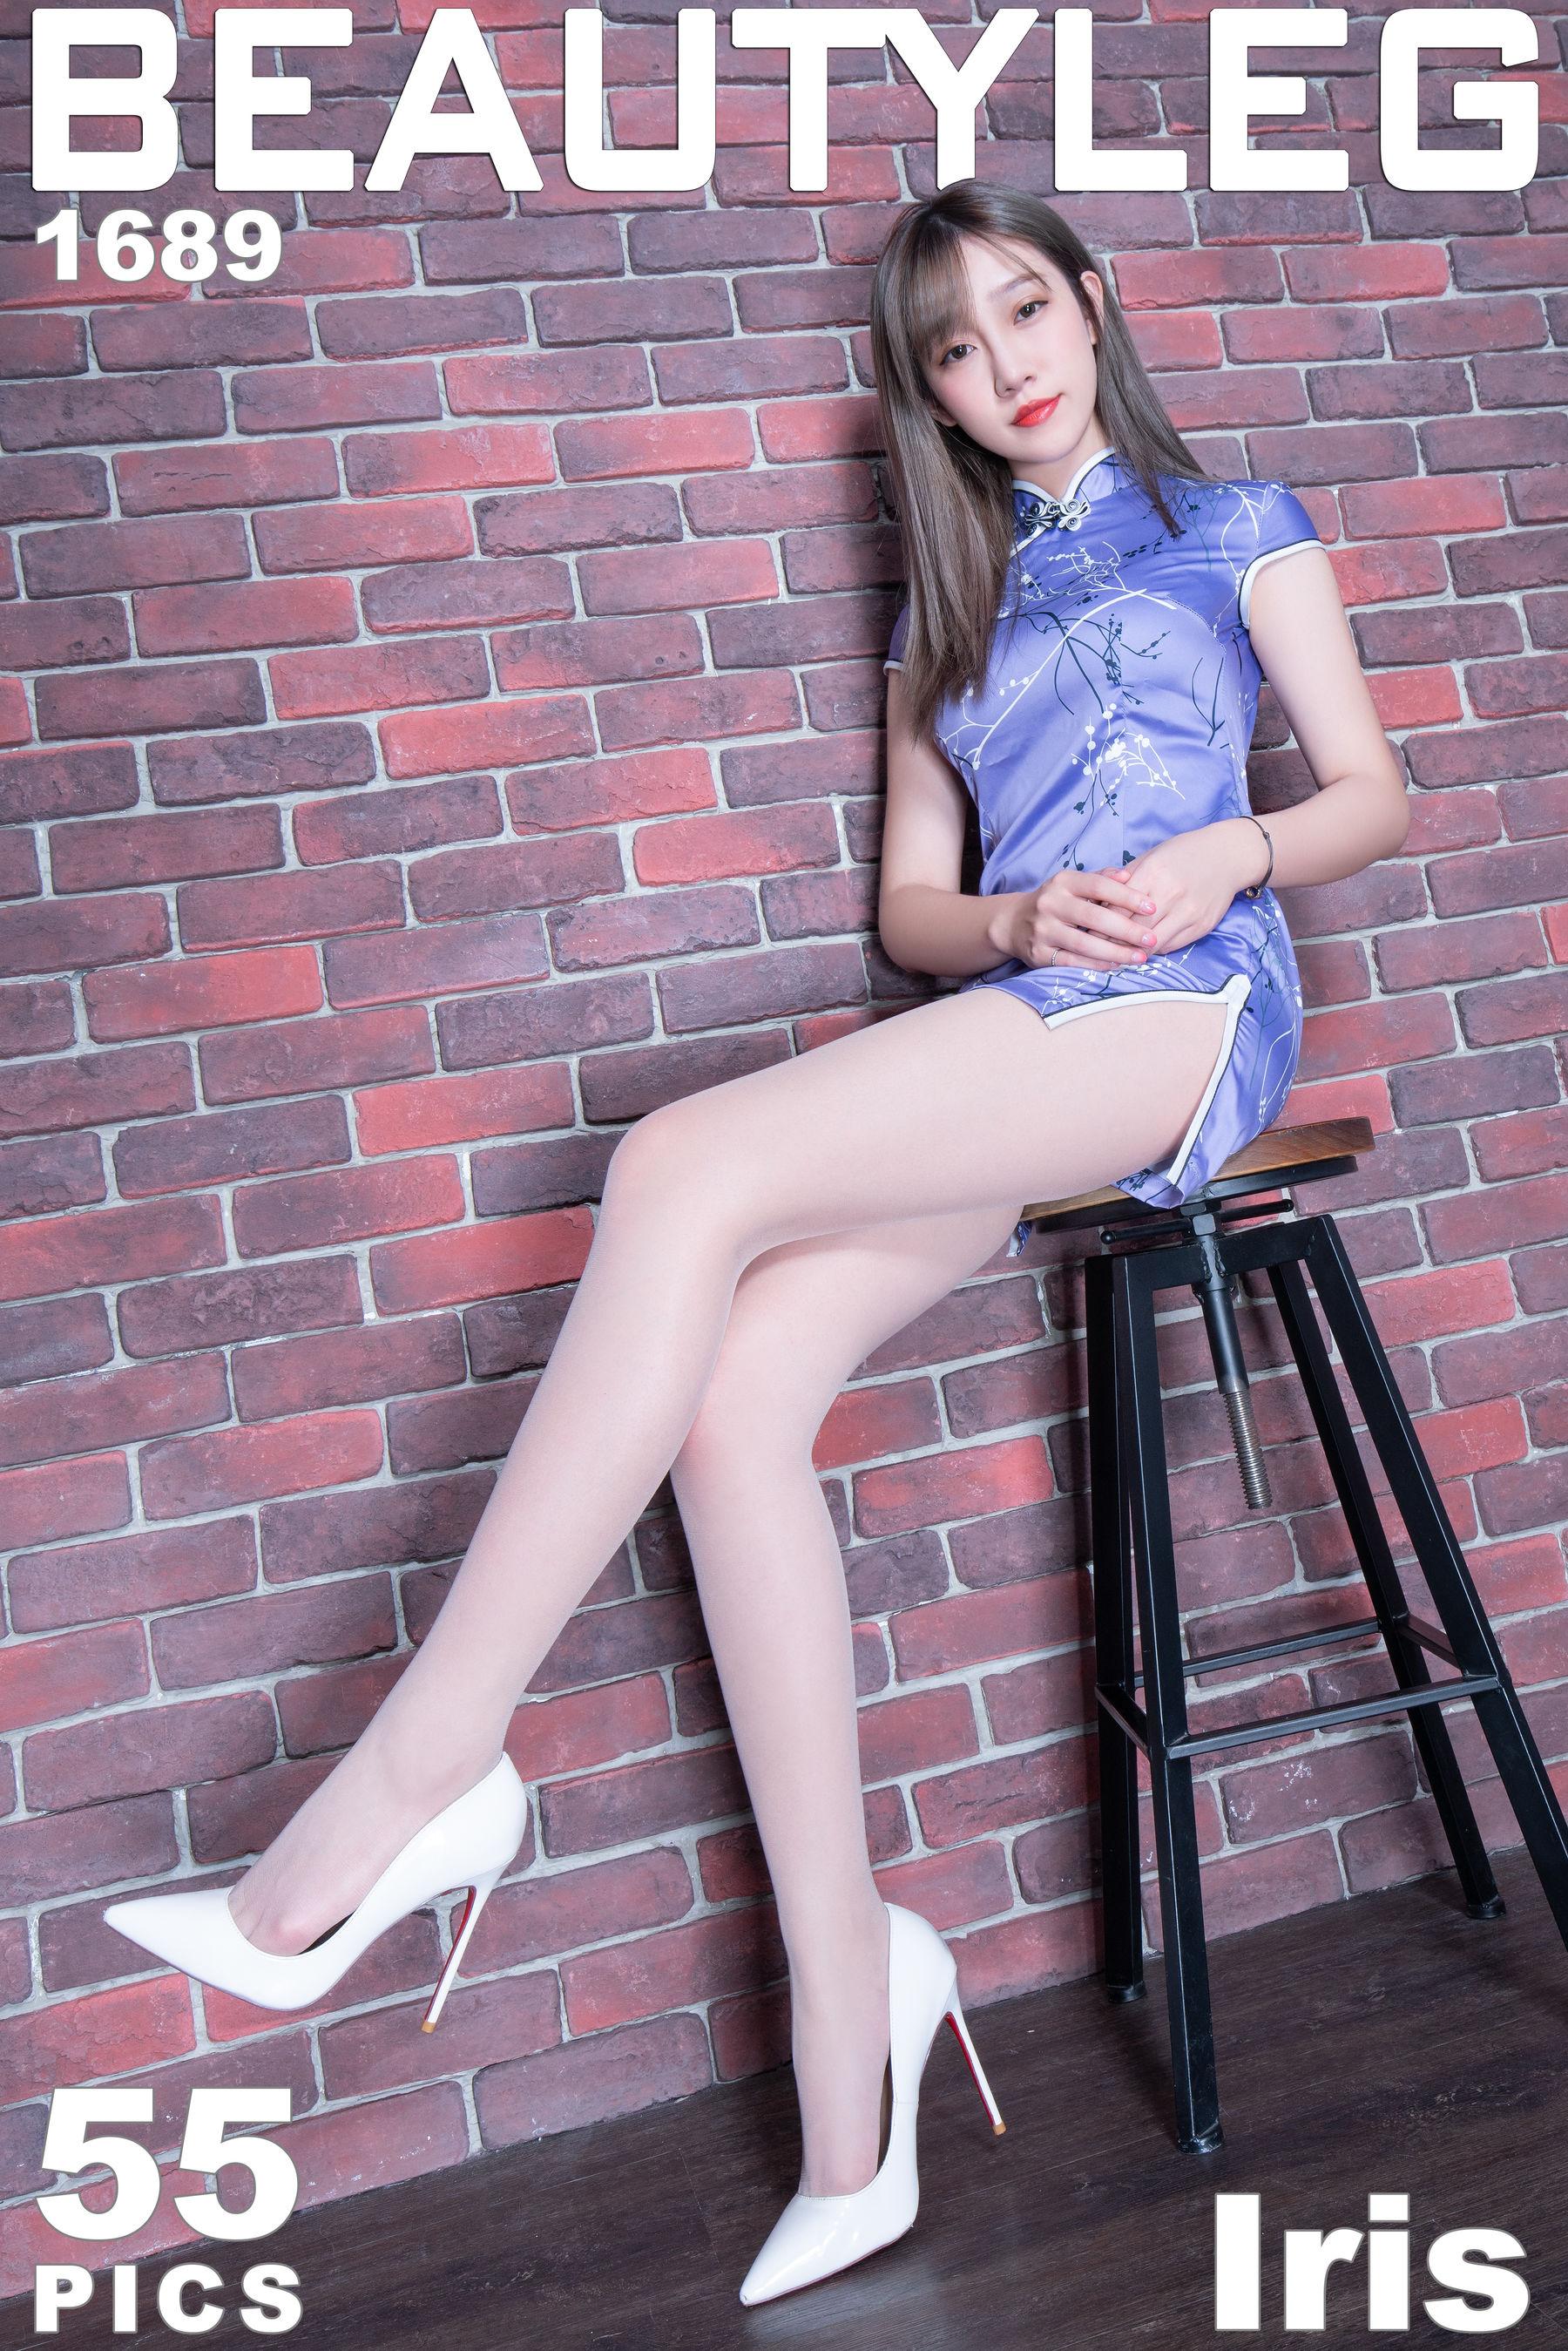 VOL.1158 [Beautyleg]旗袍丝袜美腿肉丝袜丝袜短裙:刘萱(腿模Iris)超高清个人性感漂亮大图(55P)